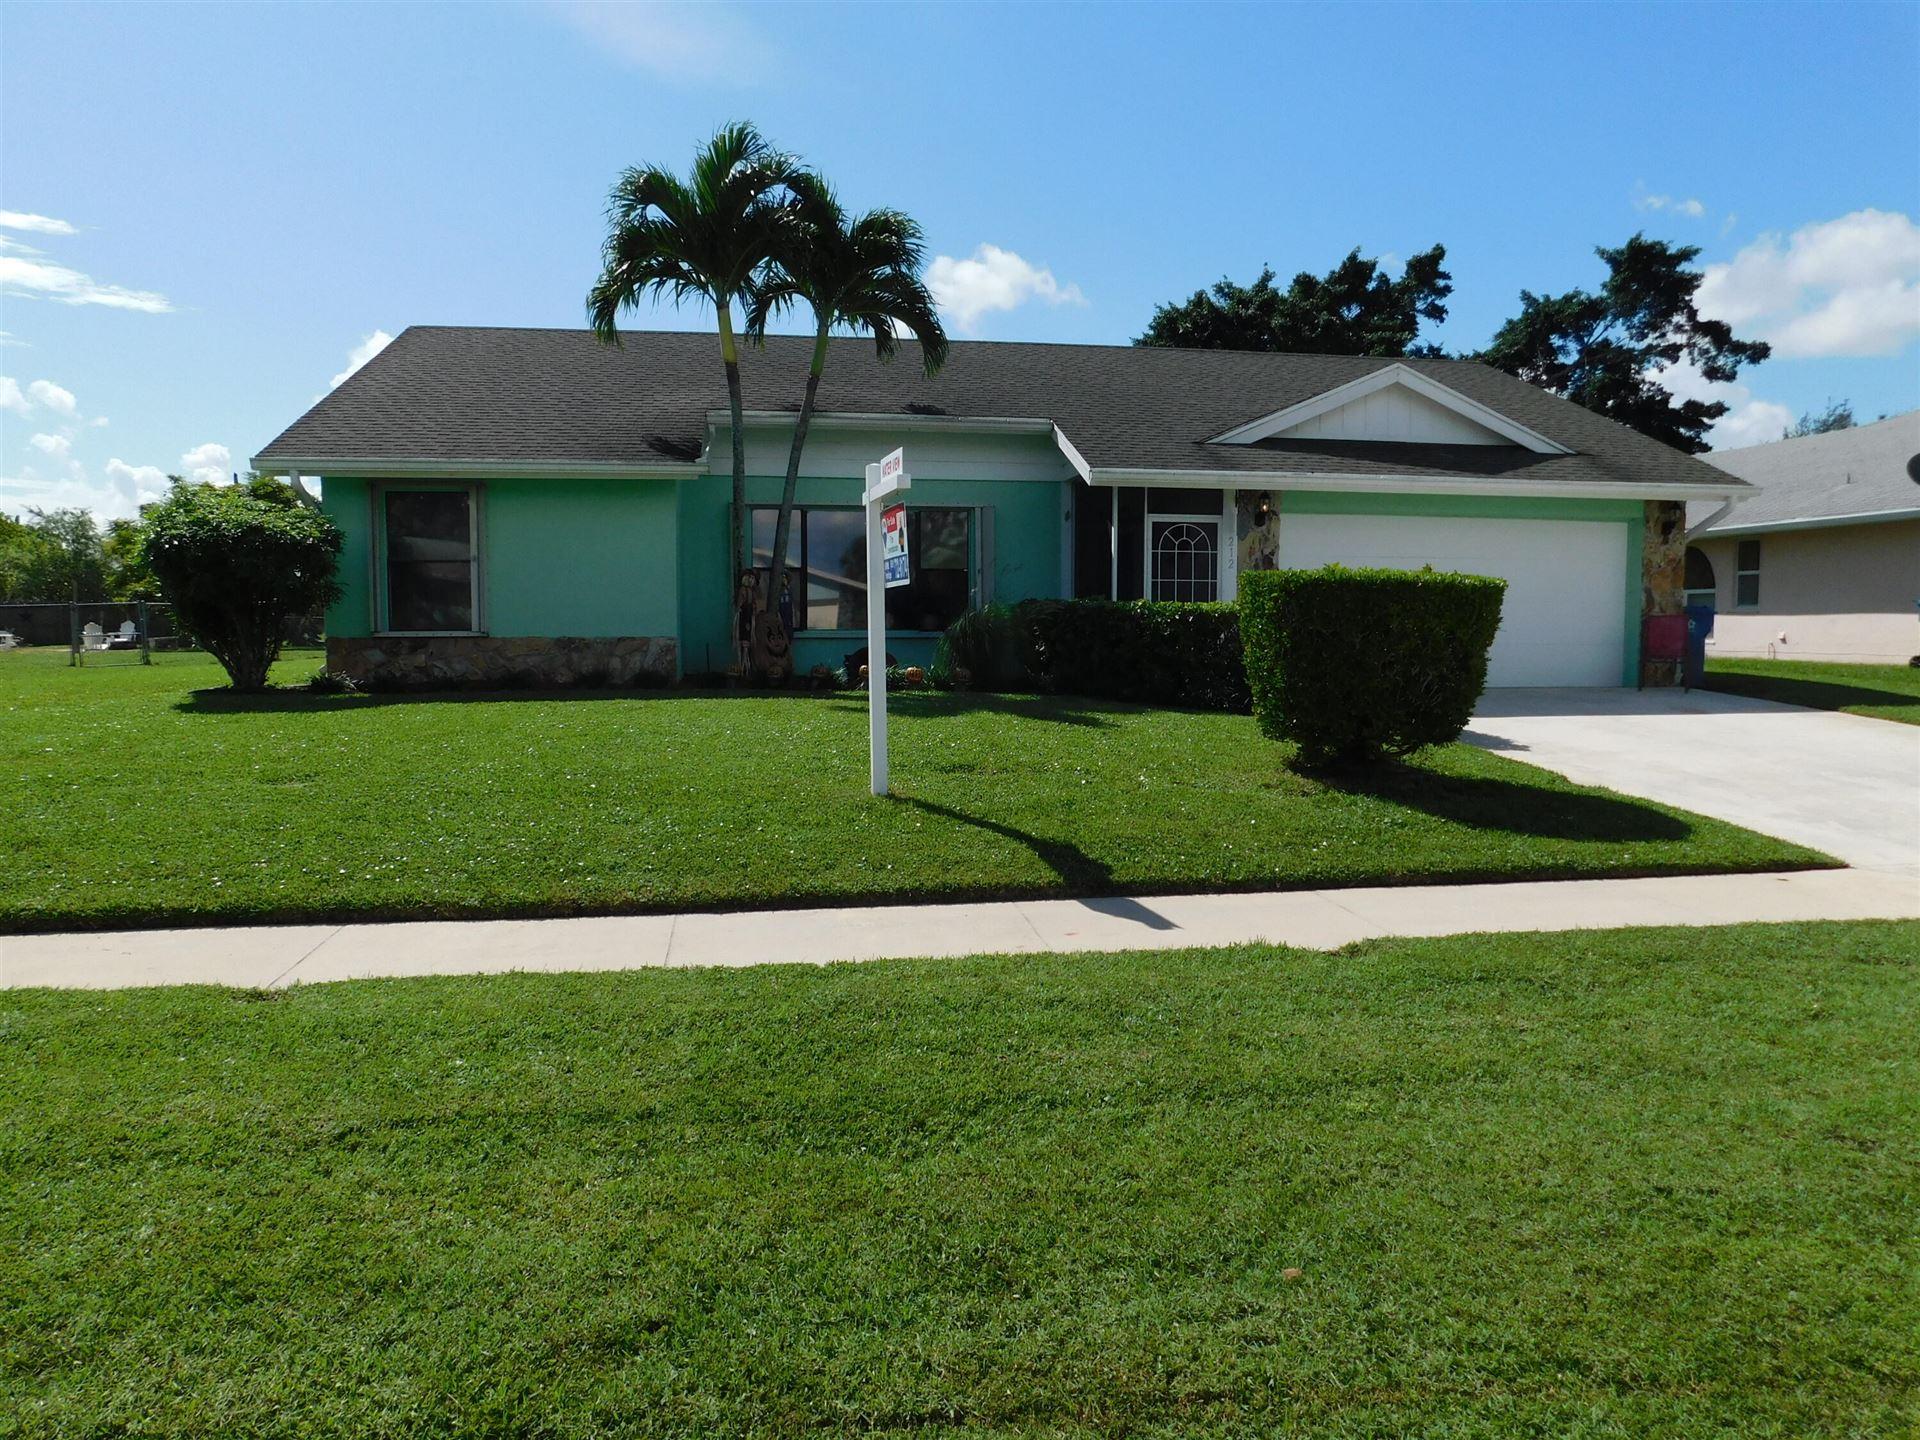 212 Las Palmas Street, Royal Palm Beach, FL 33411 - #: RX-10748558